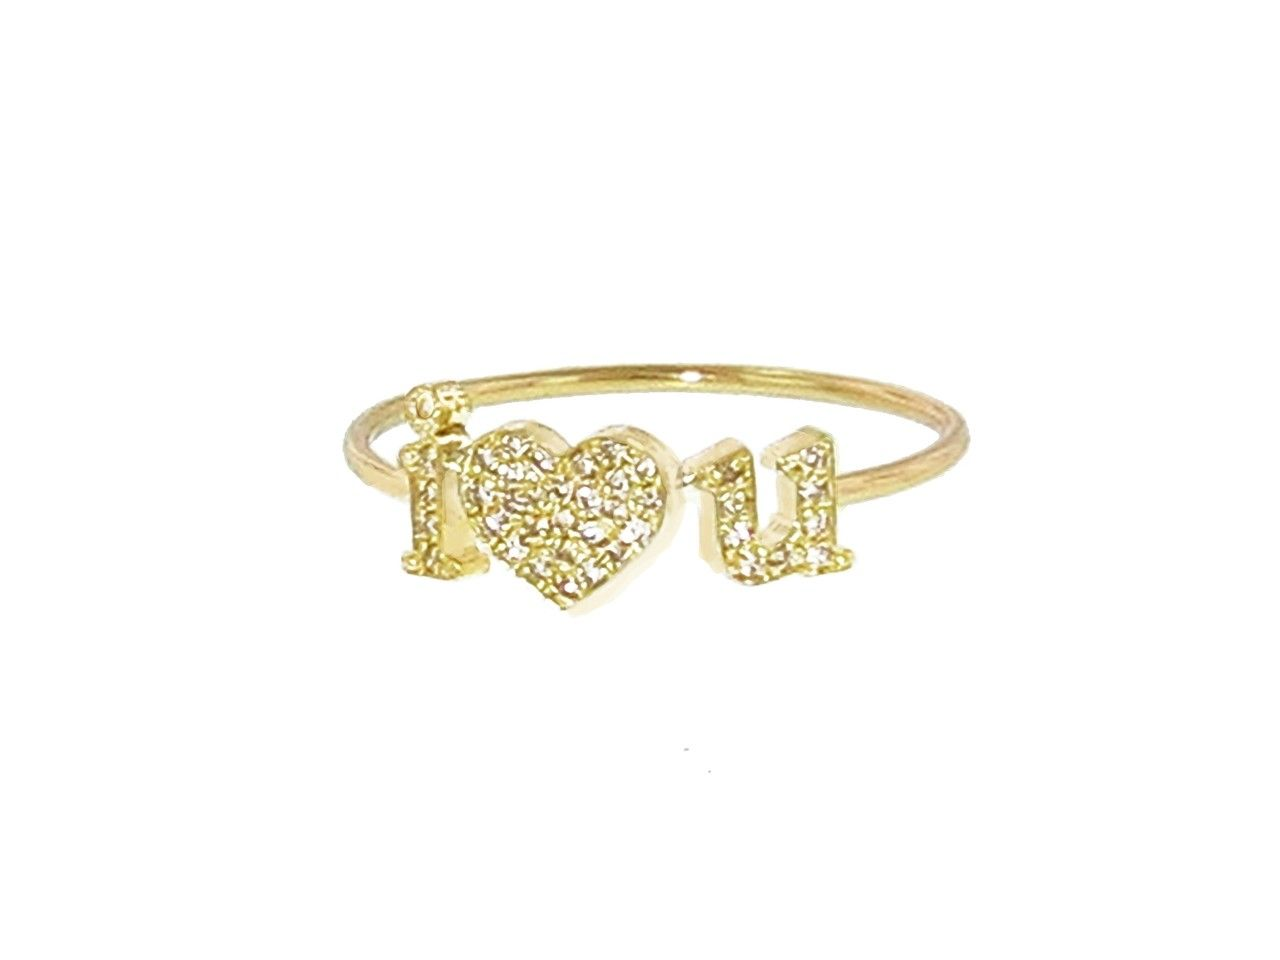 I <3 U Ring with Diamonds - Yellow Gold  by Jennifer Meyer, at Ylang 23